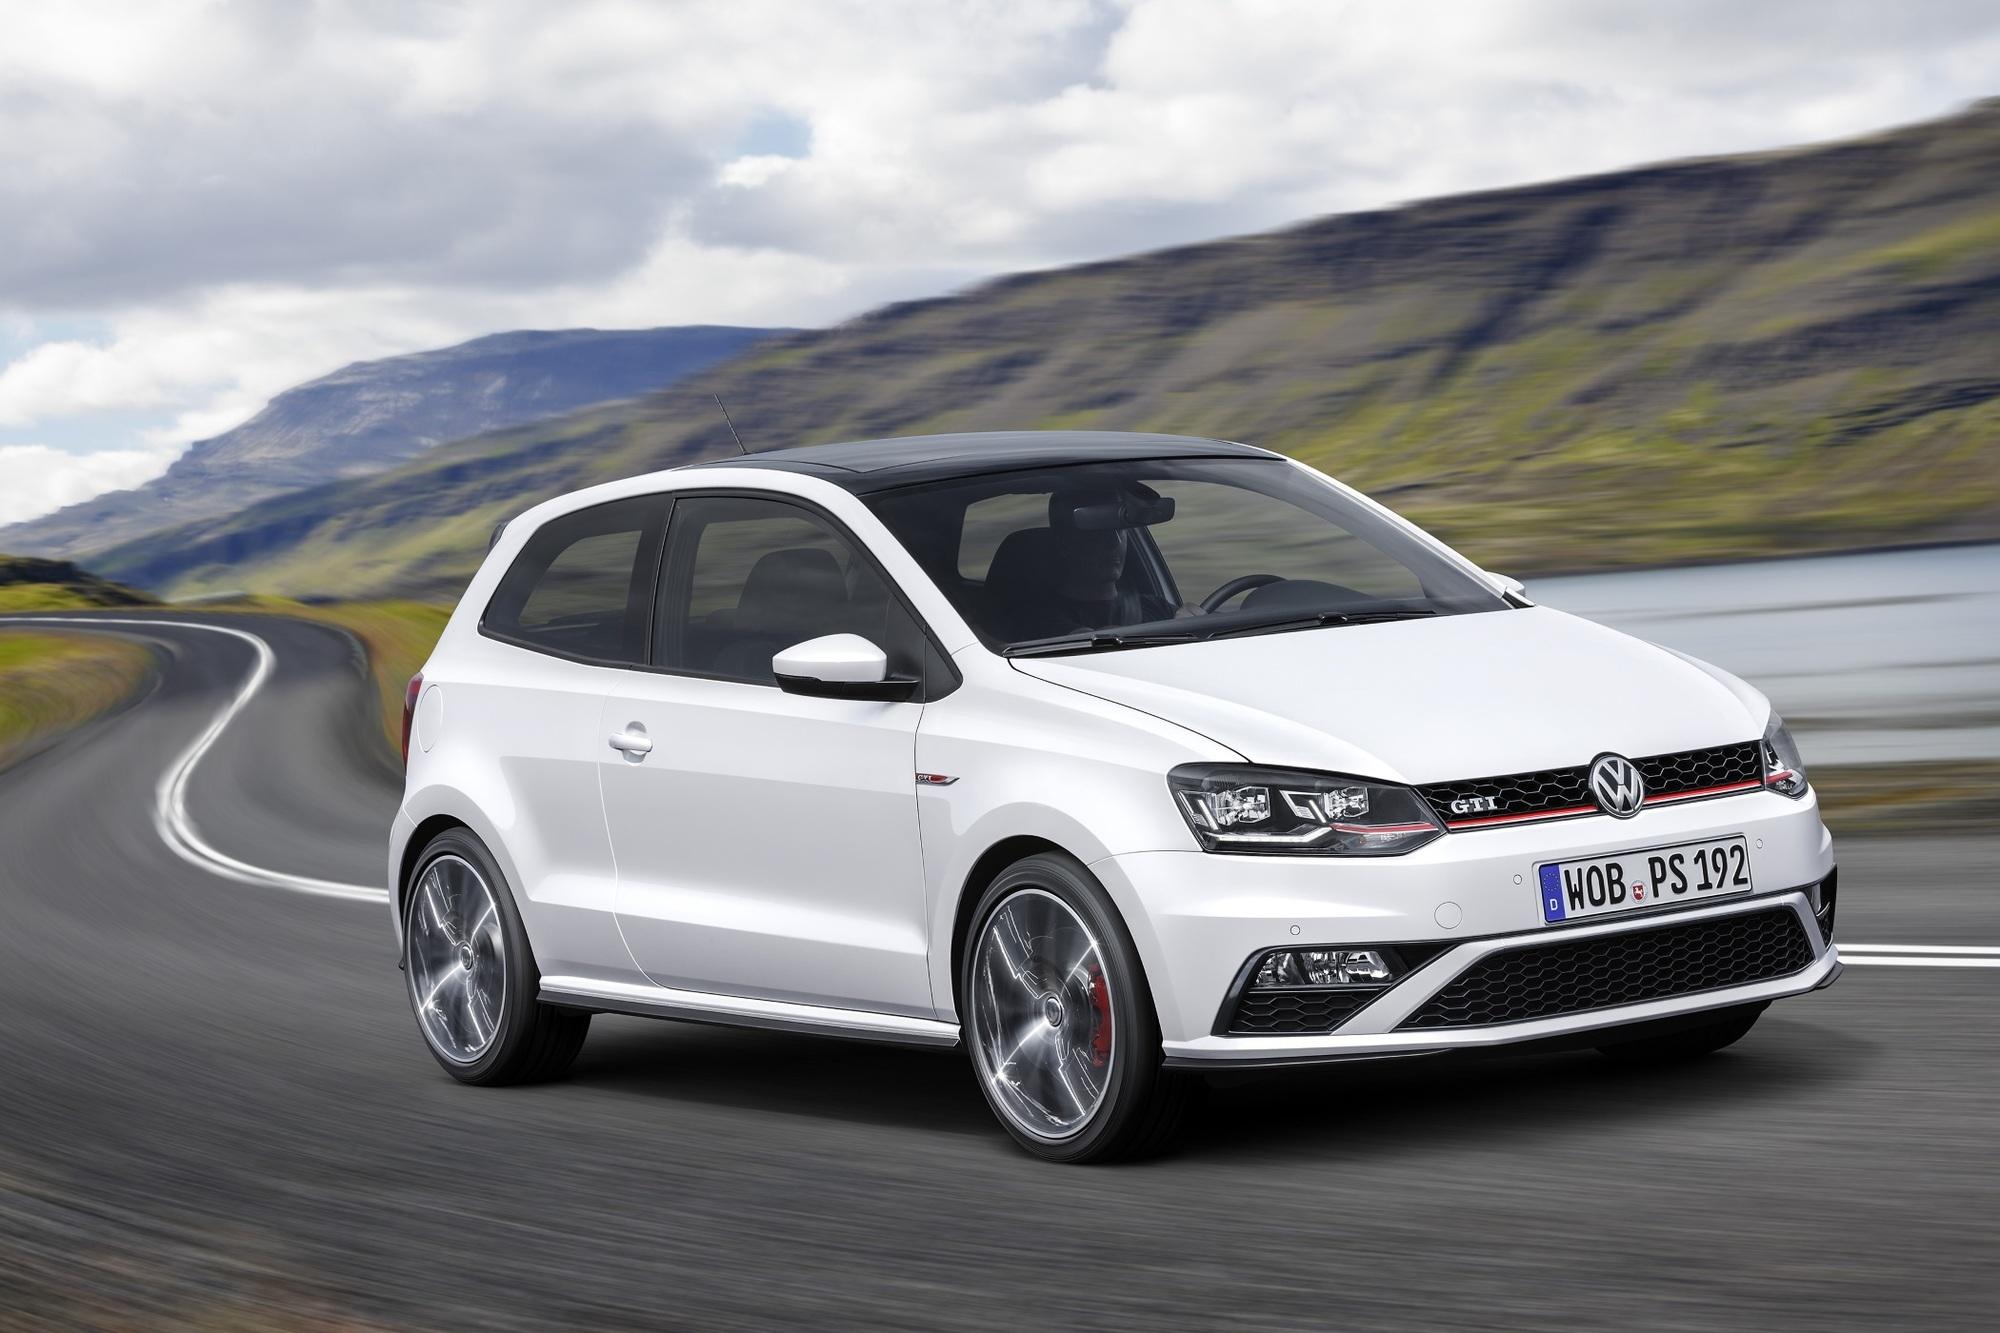 VW Polo GTI - Stärker und härter